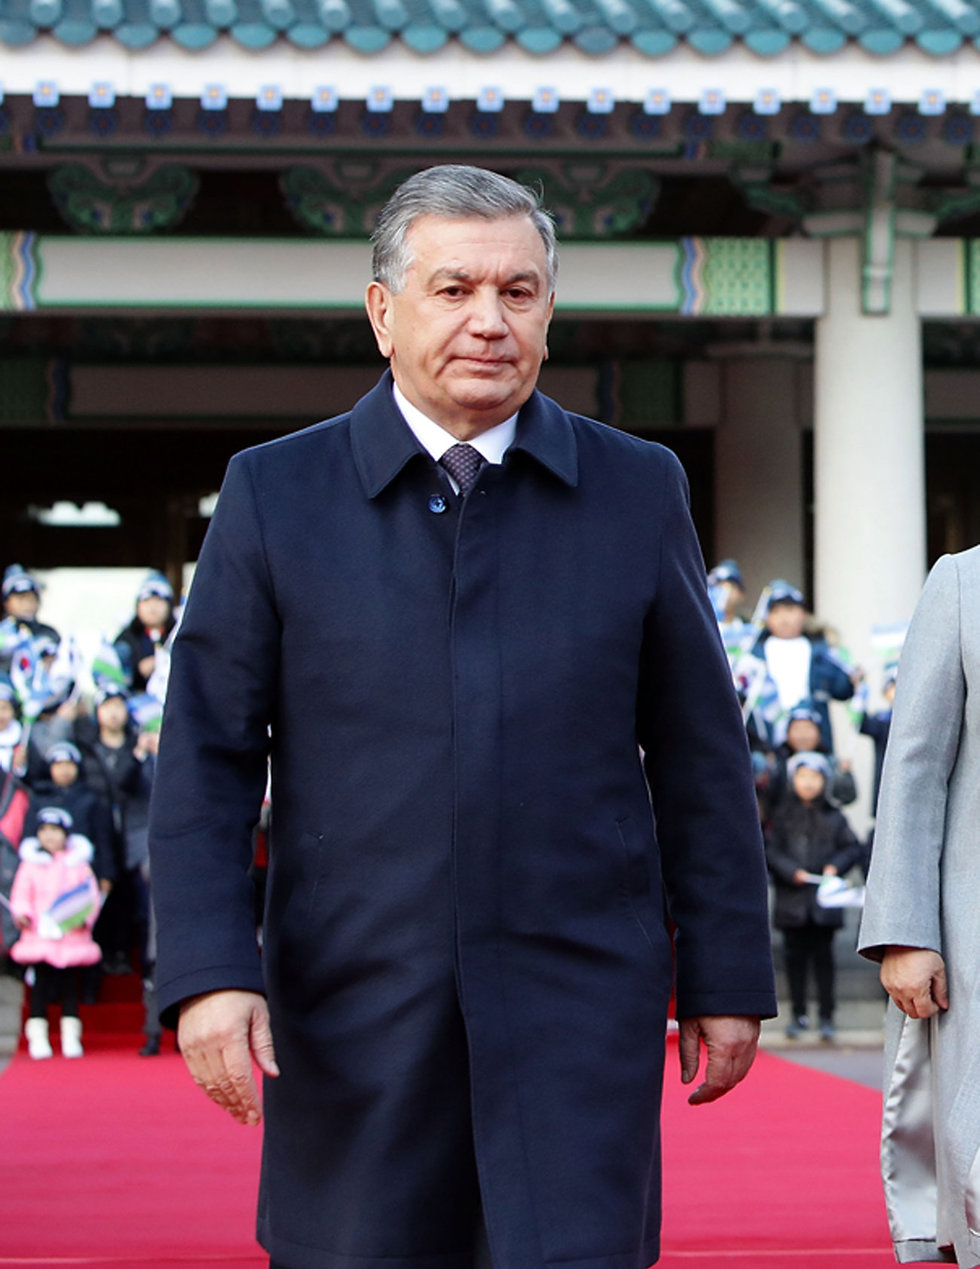 שבקט מירזייאיב, נשיא אוזבקיסטן (צילום: Franjo Lozancic)